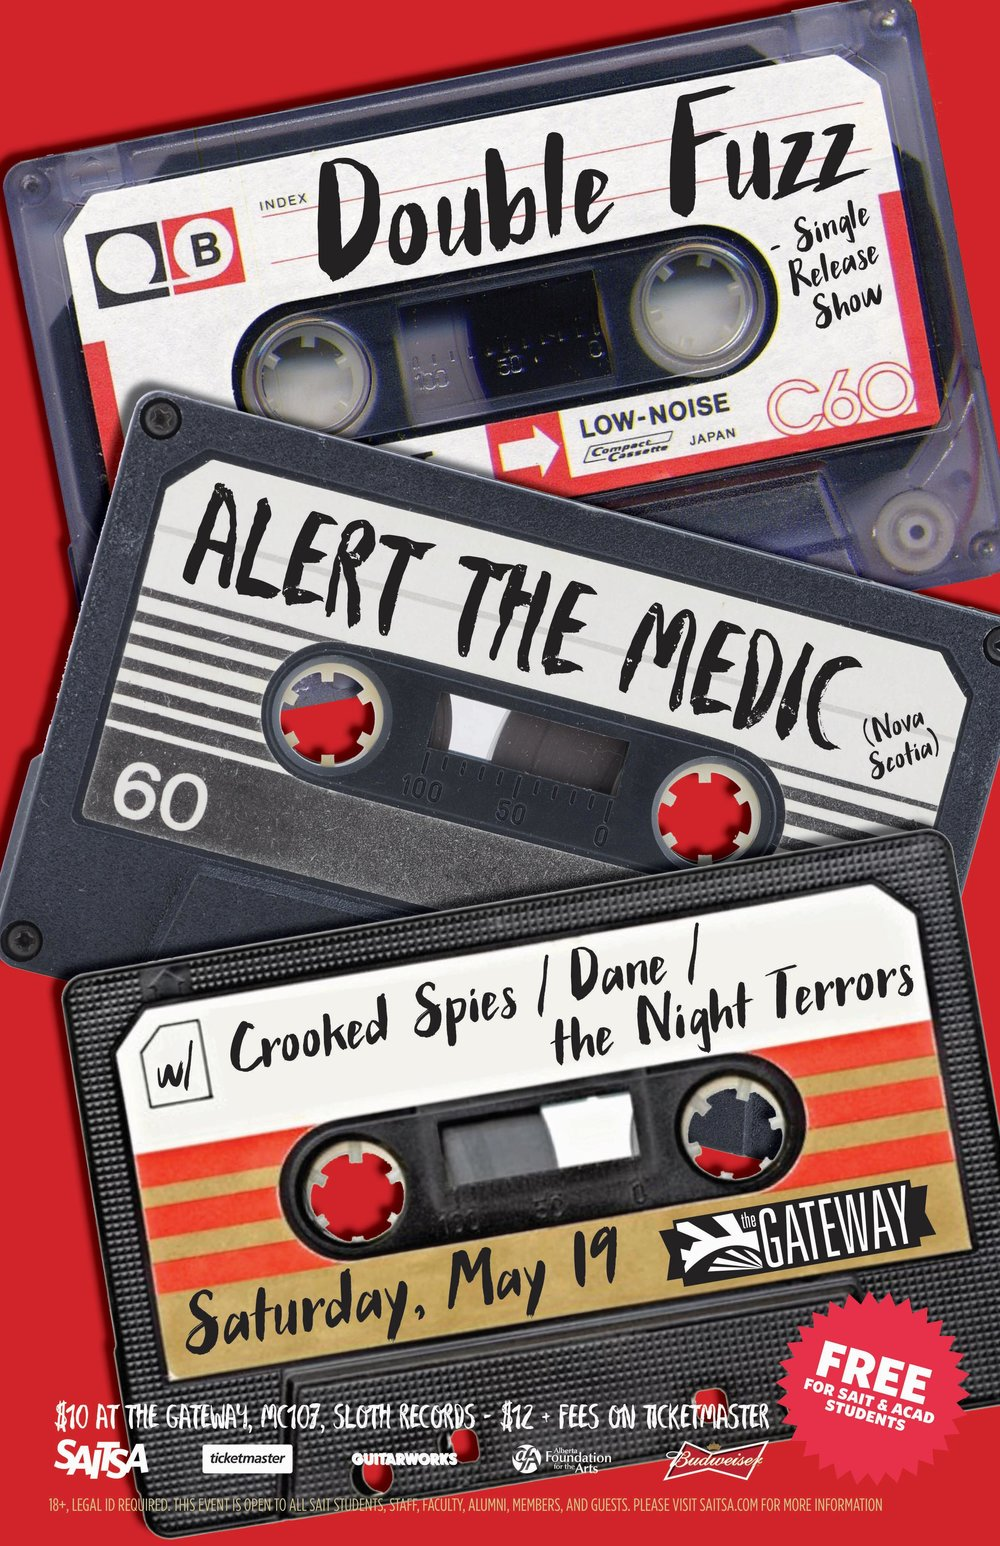 Saturday, May 19 @ The Gateway w/ Double Fuzz, Alert The Medic, DANE & The Night Terrors -